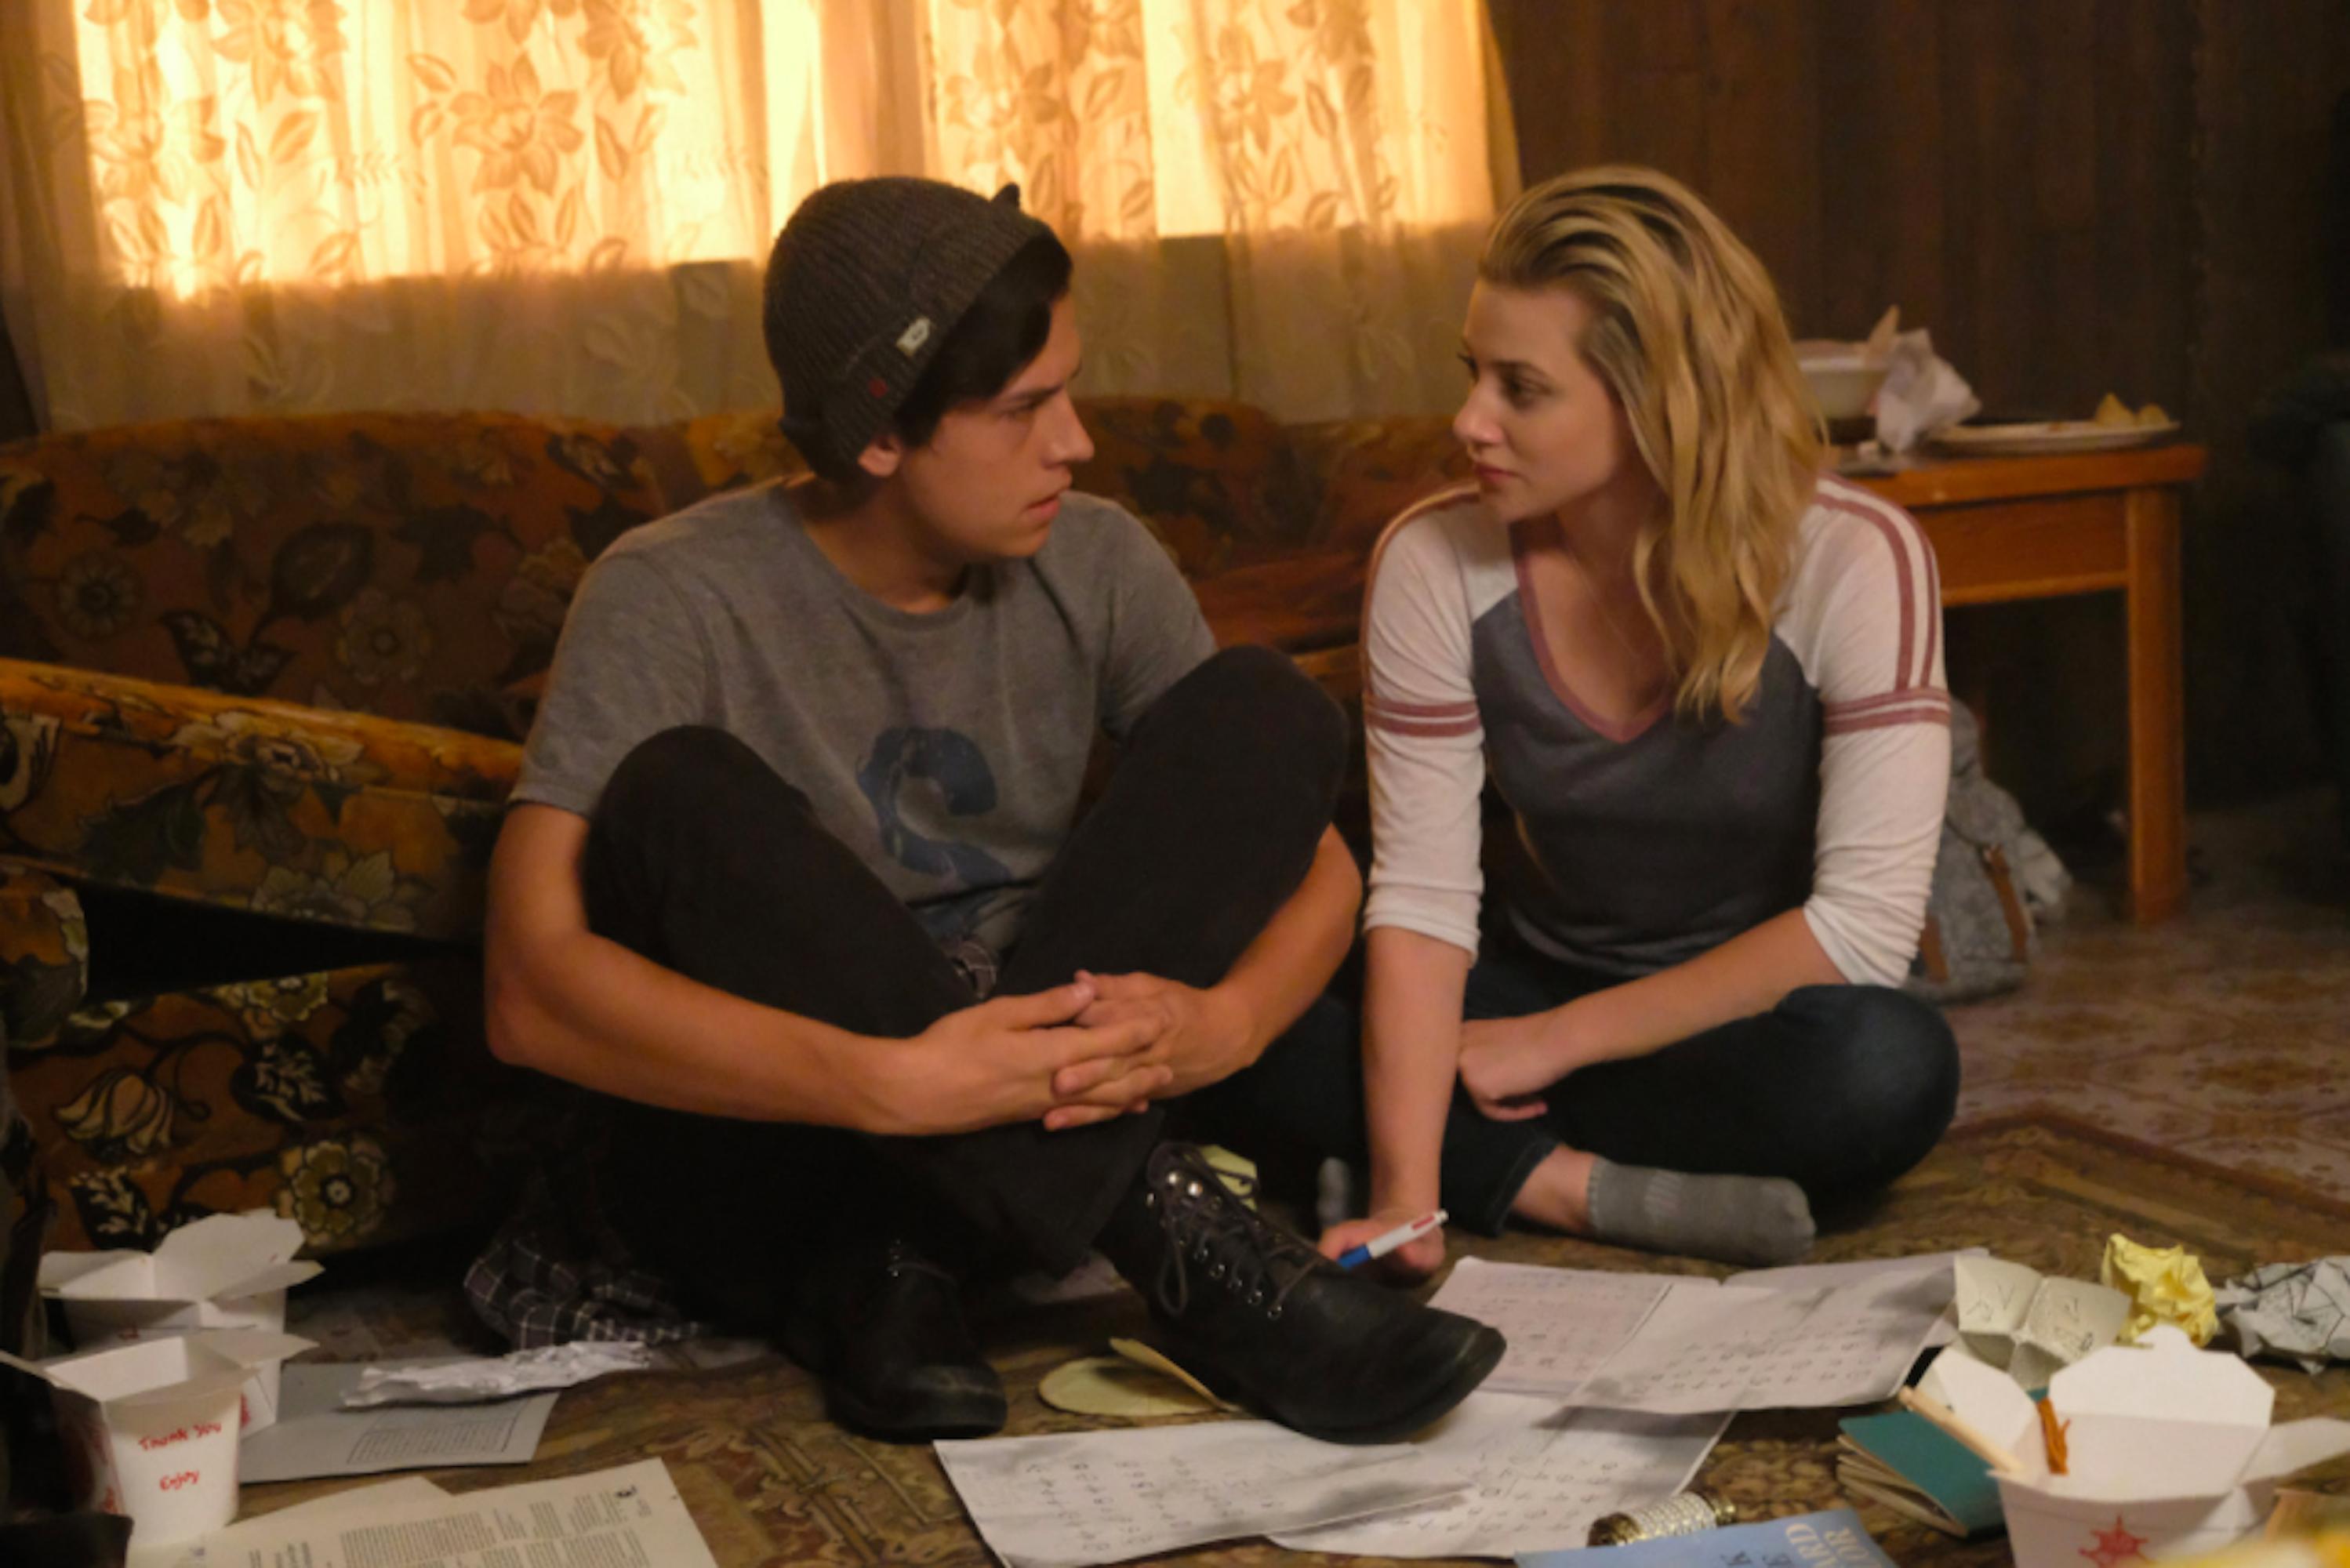 Riverdale Season 2 Episode 4 Recap The Town That Dreaded